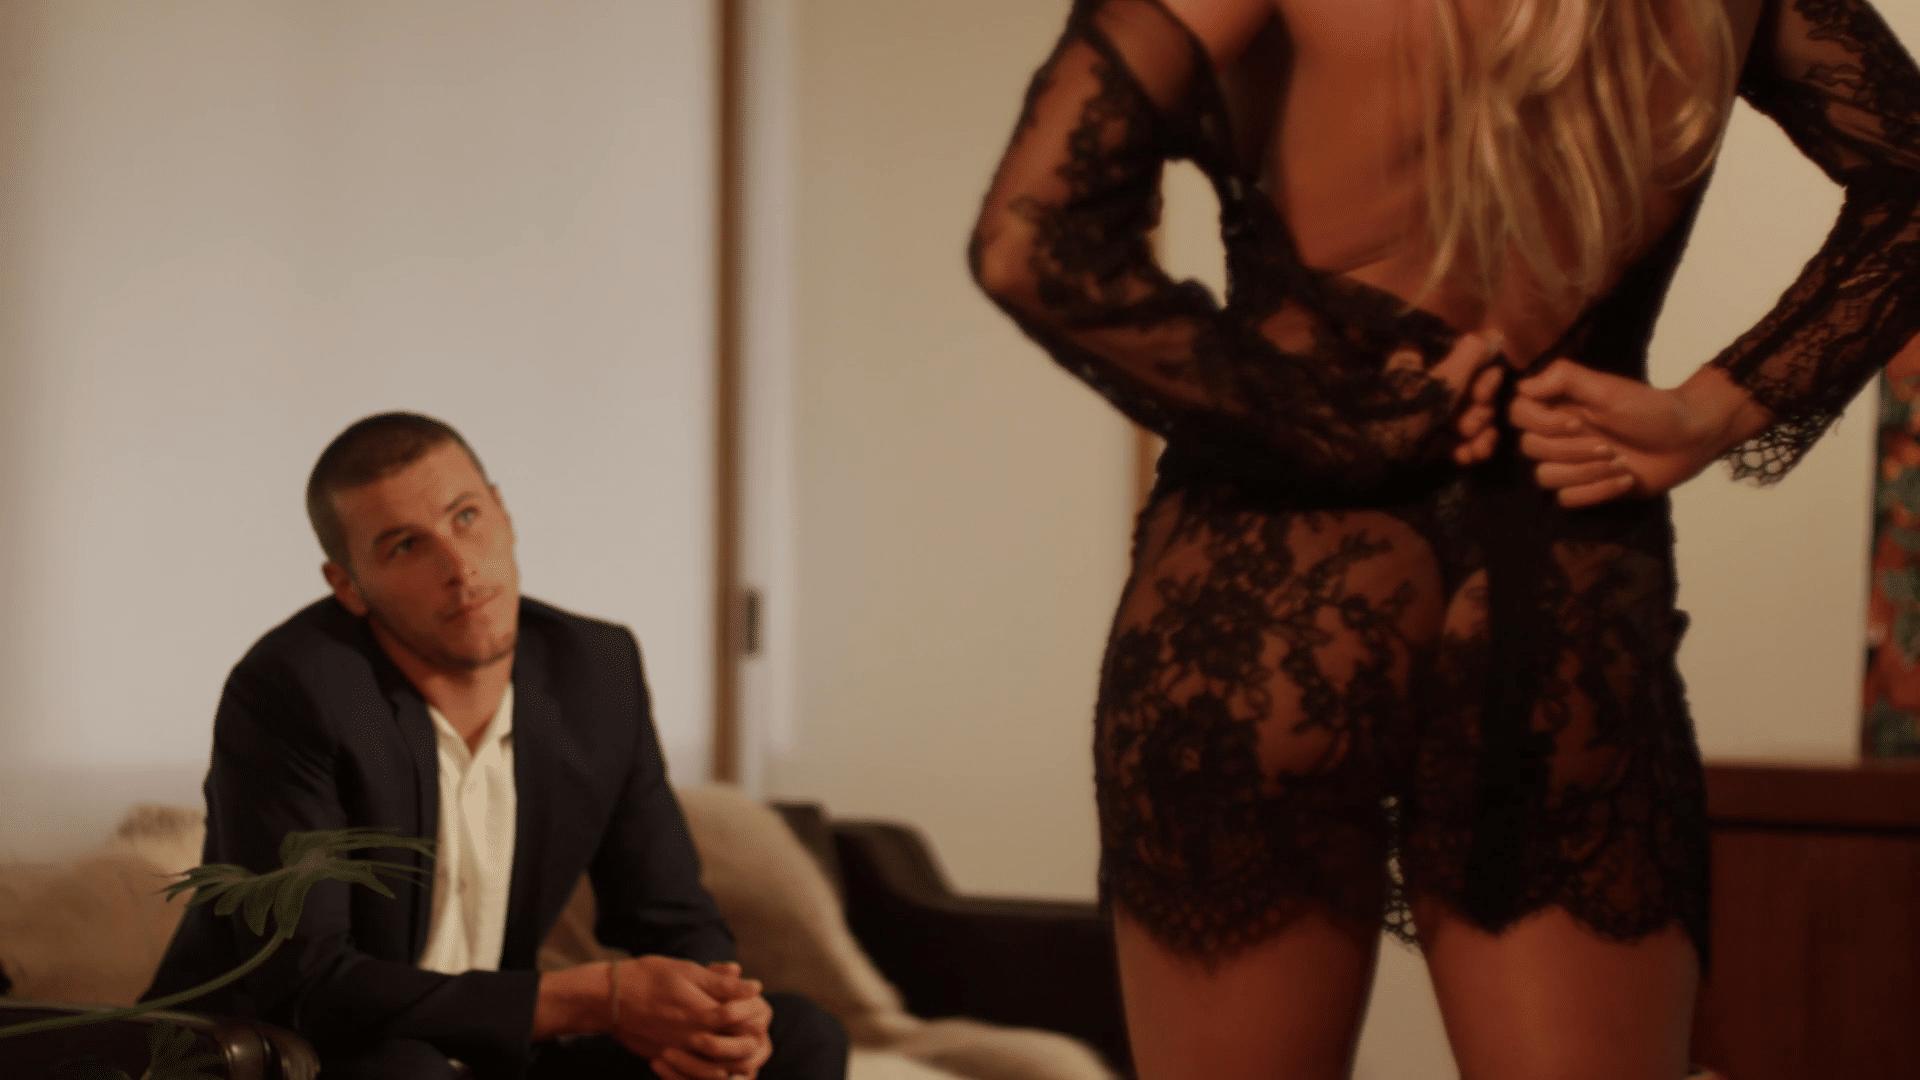 Jack Freestone et Alana Blanchard leur vidéo hot